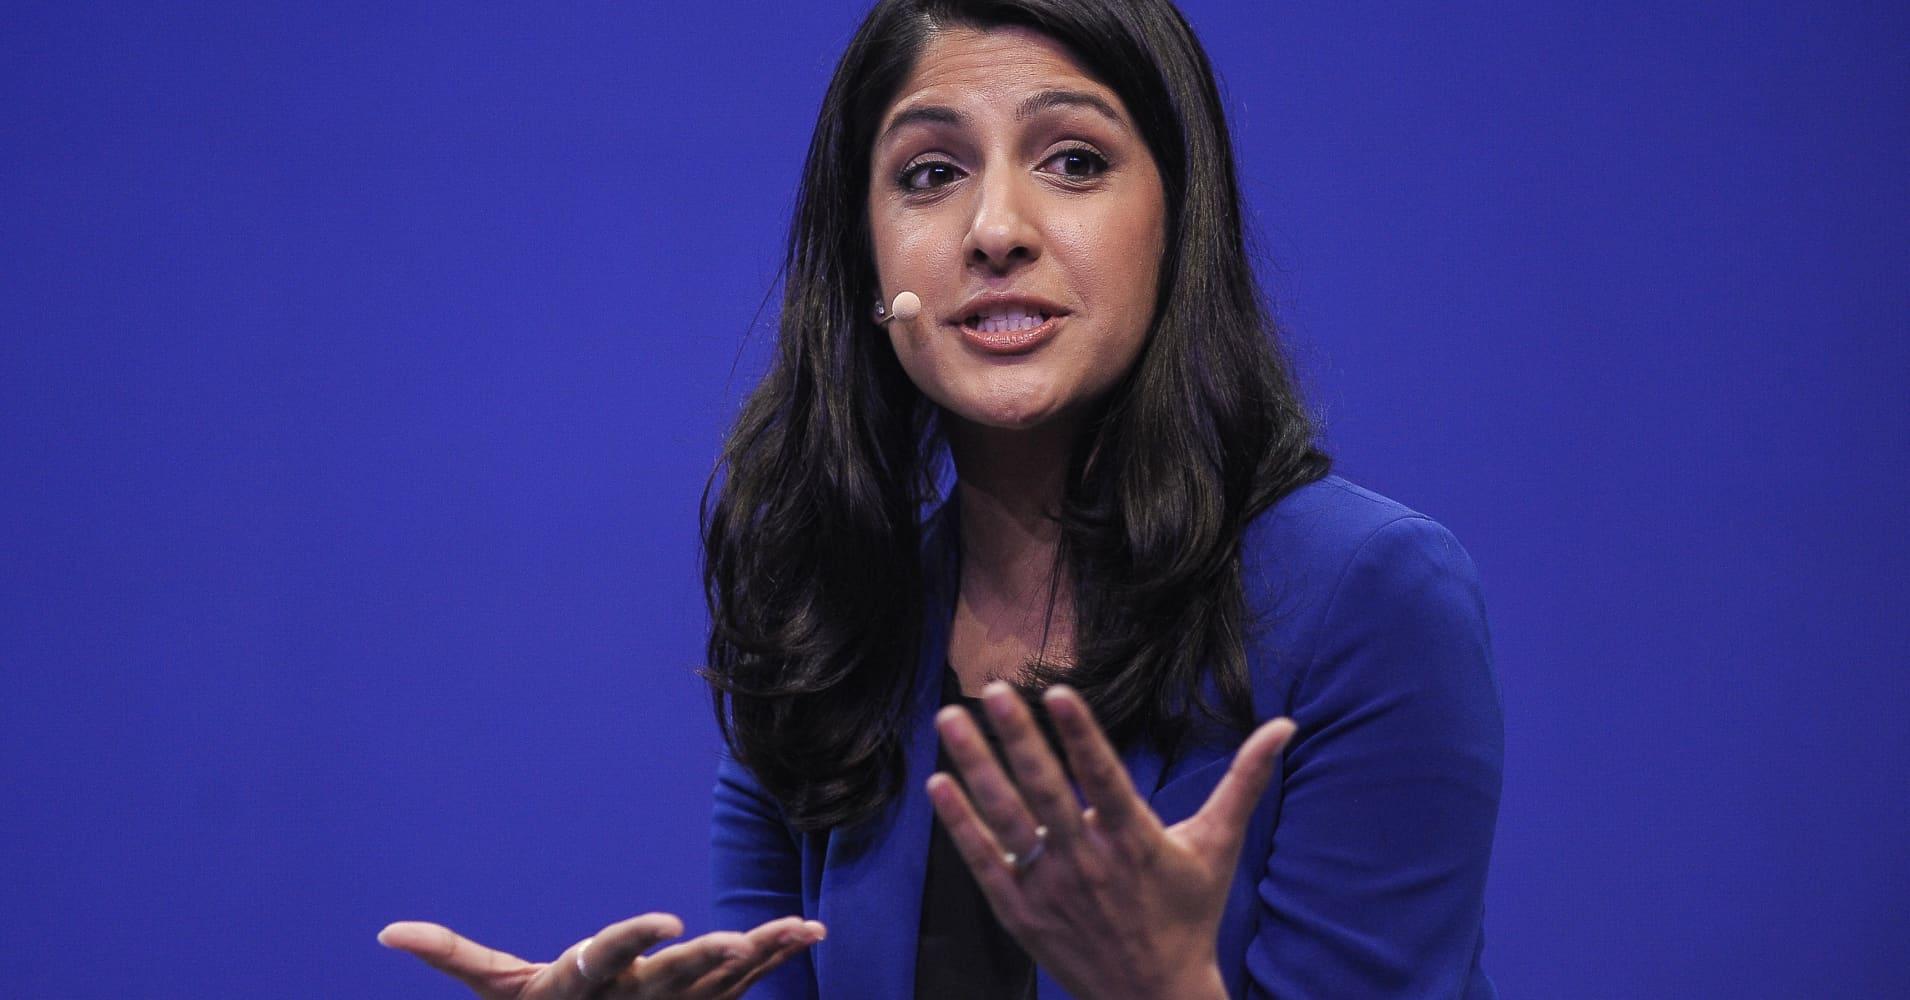 Anjali Sud, CEO of Vimeo